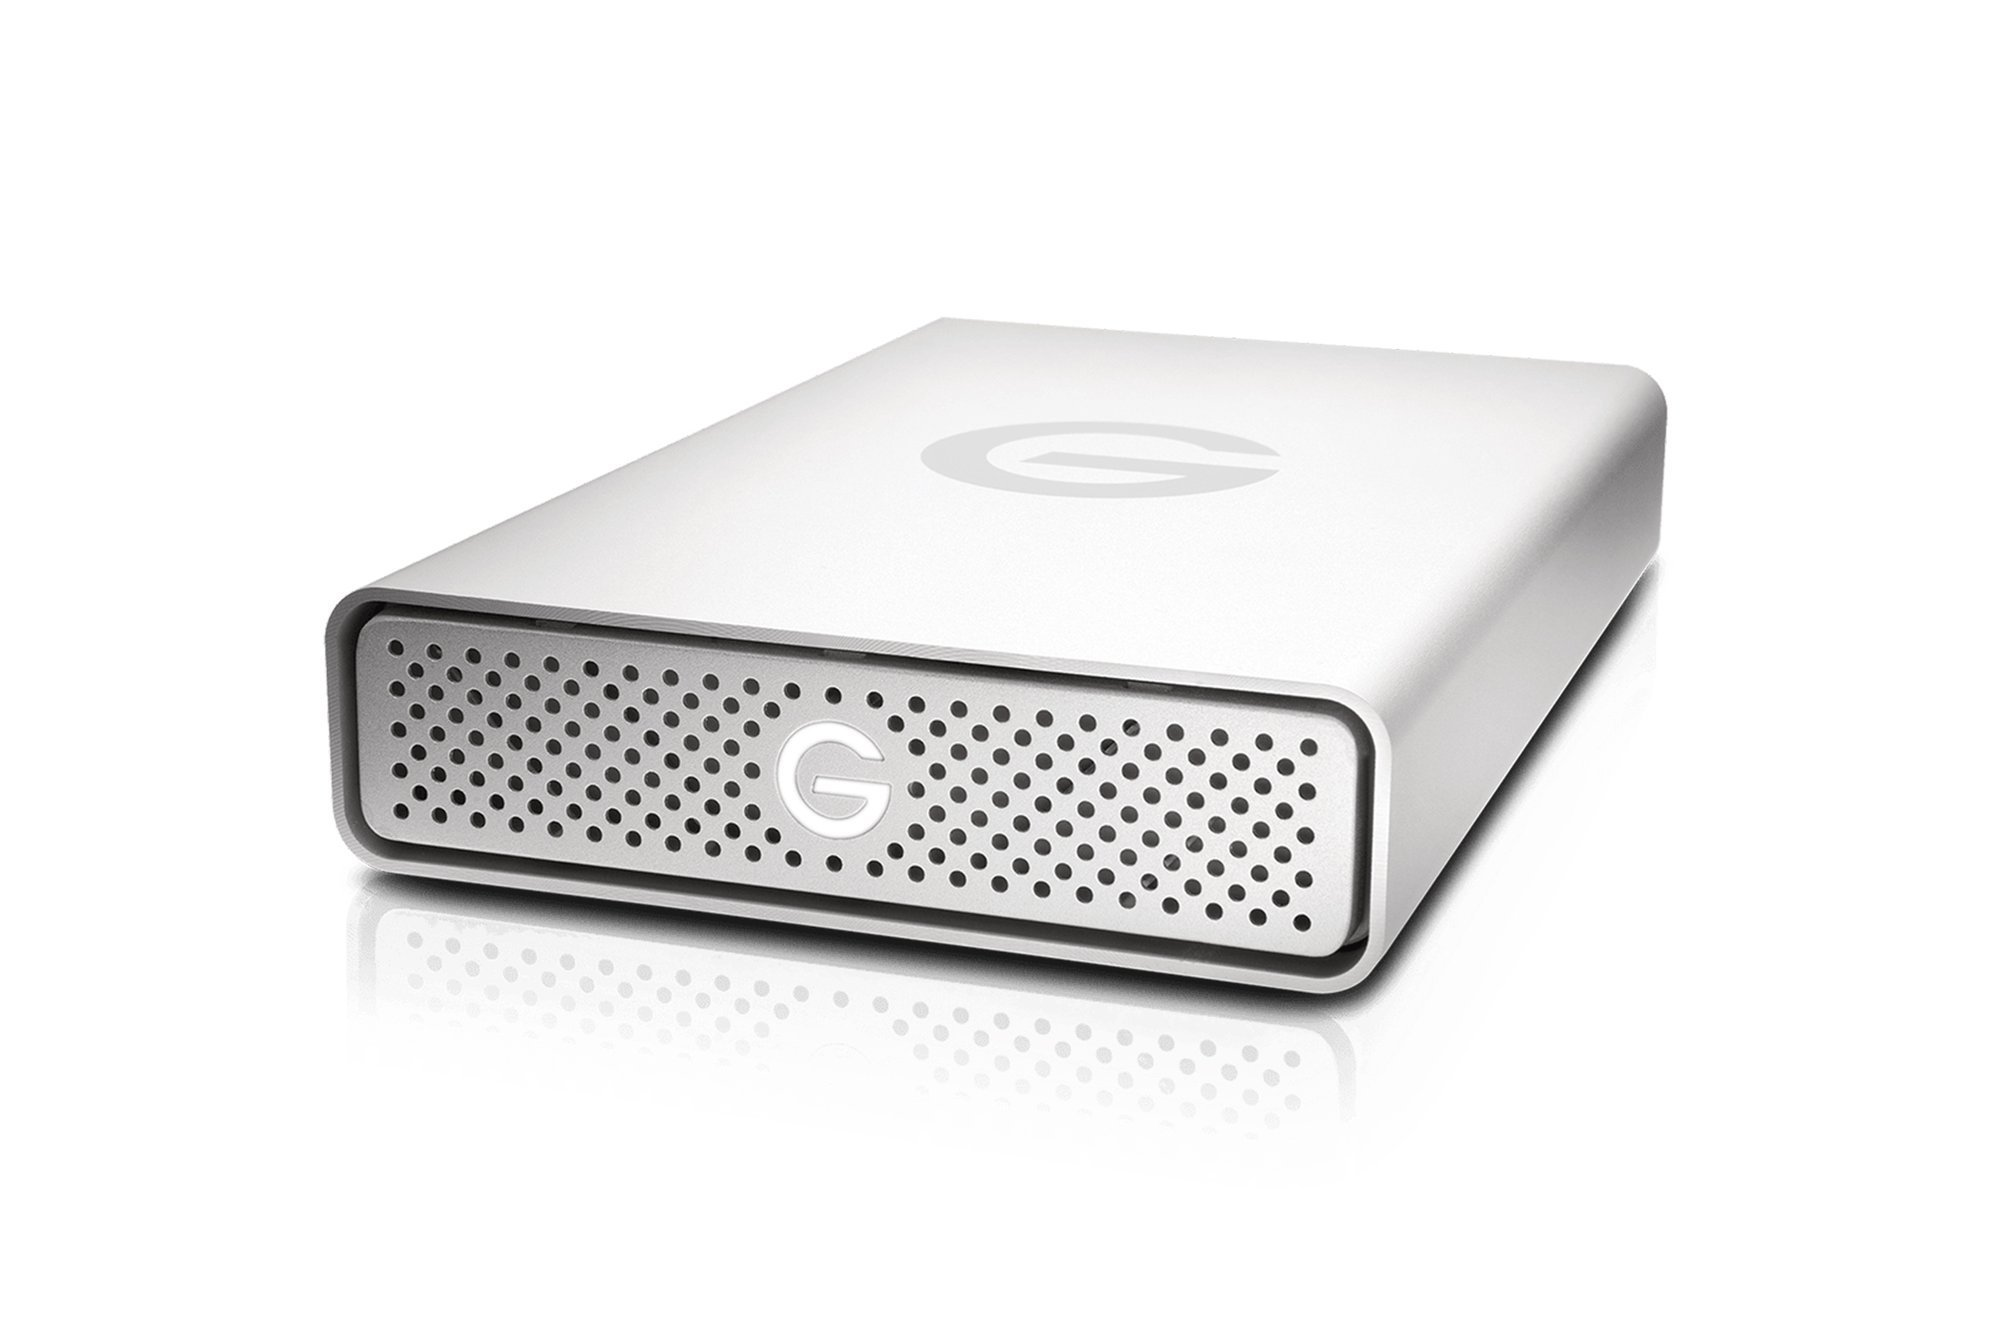 G-Technologie G-DRIVE USB-C Externe Festplatte 14TB USB 3.1